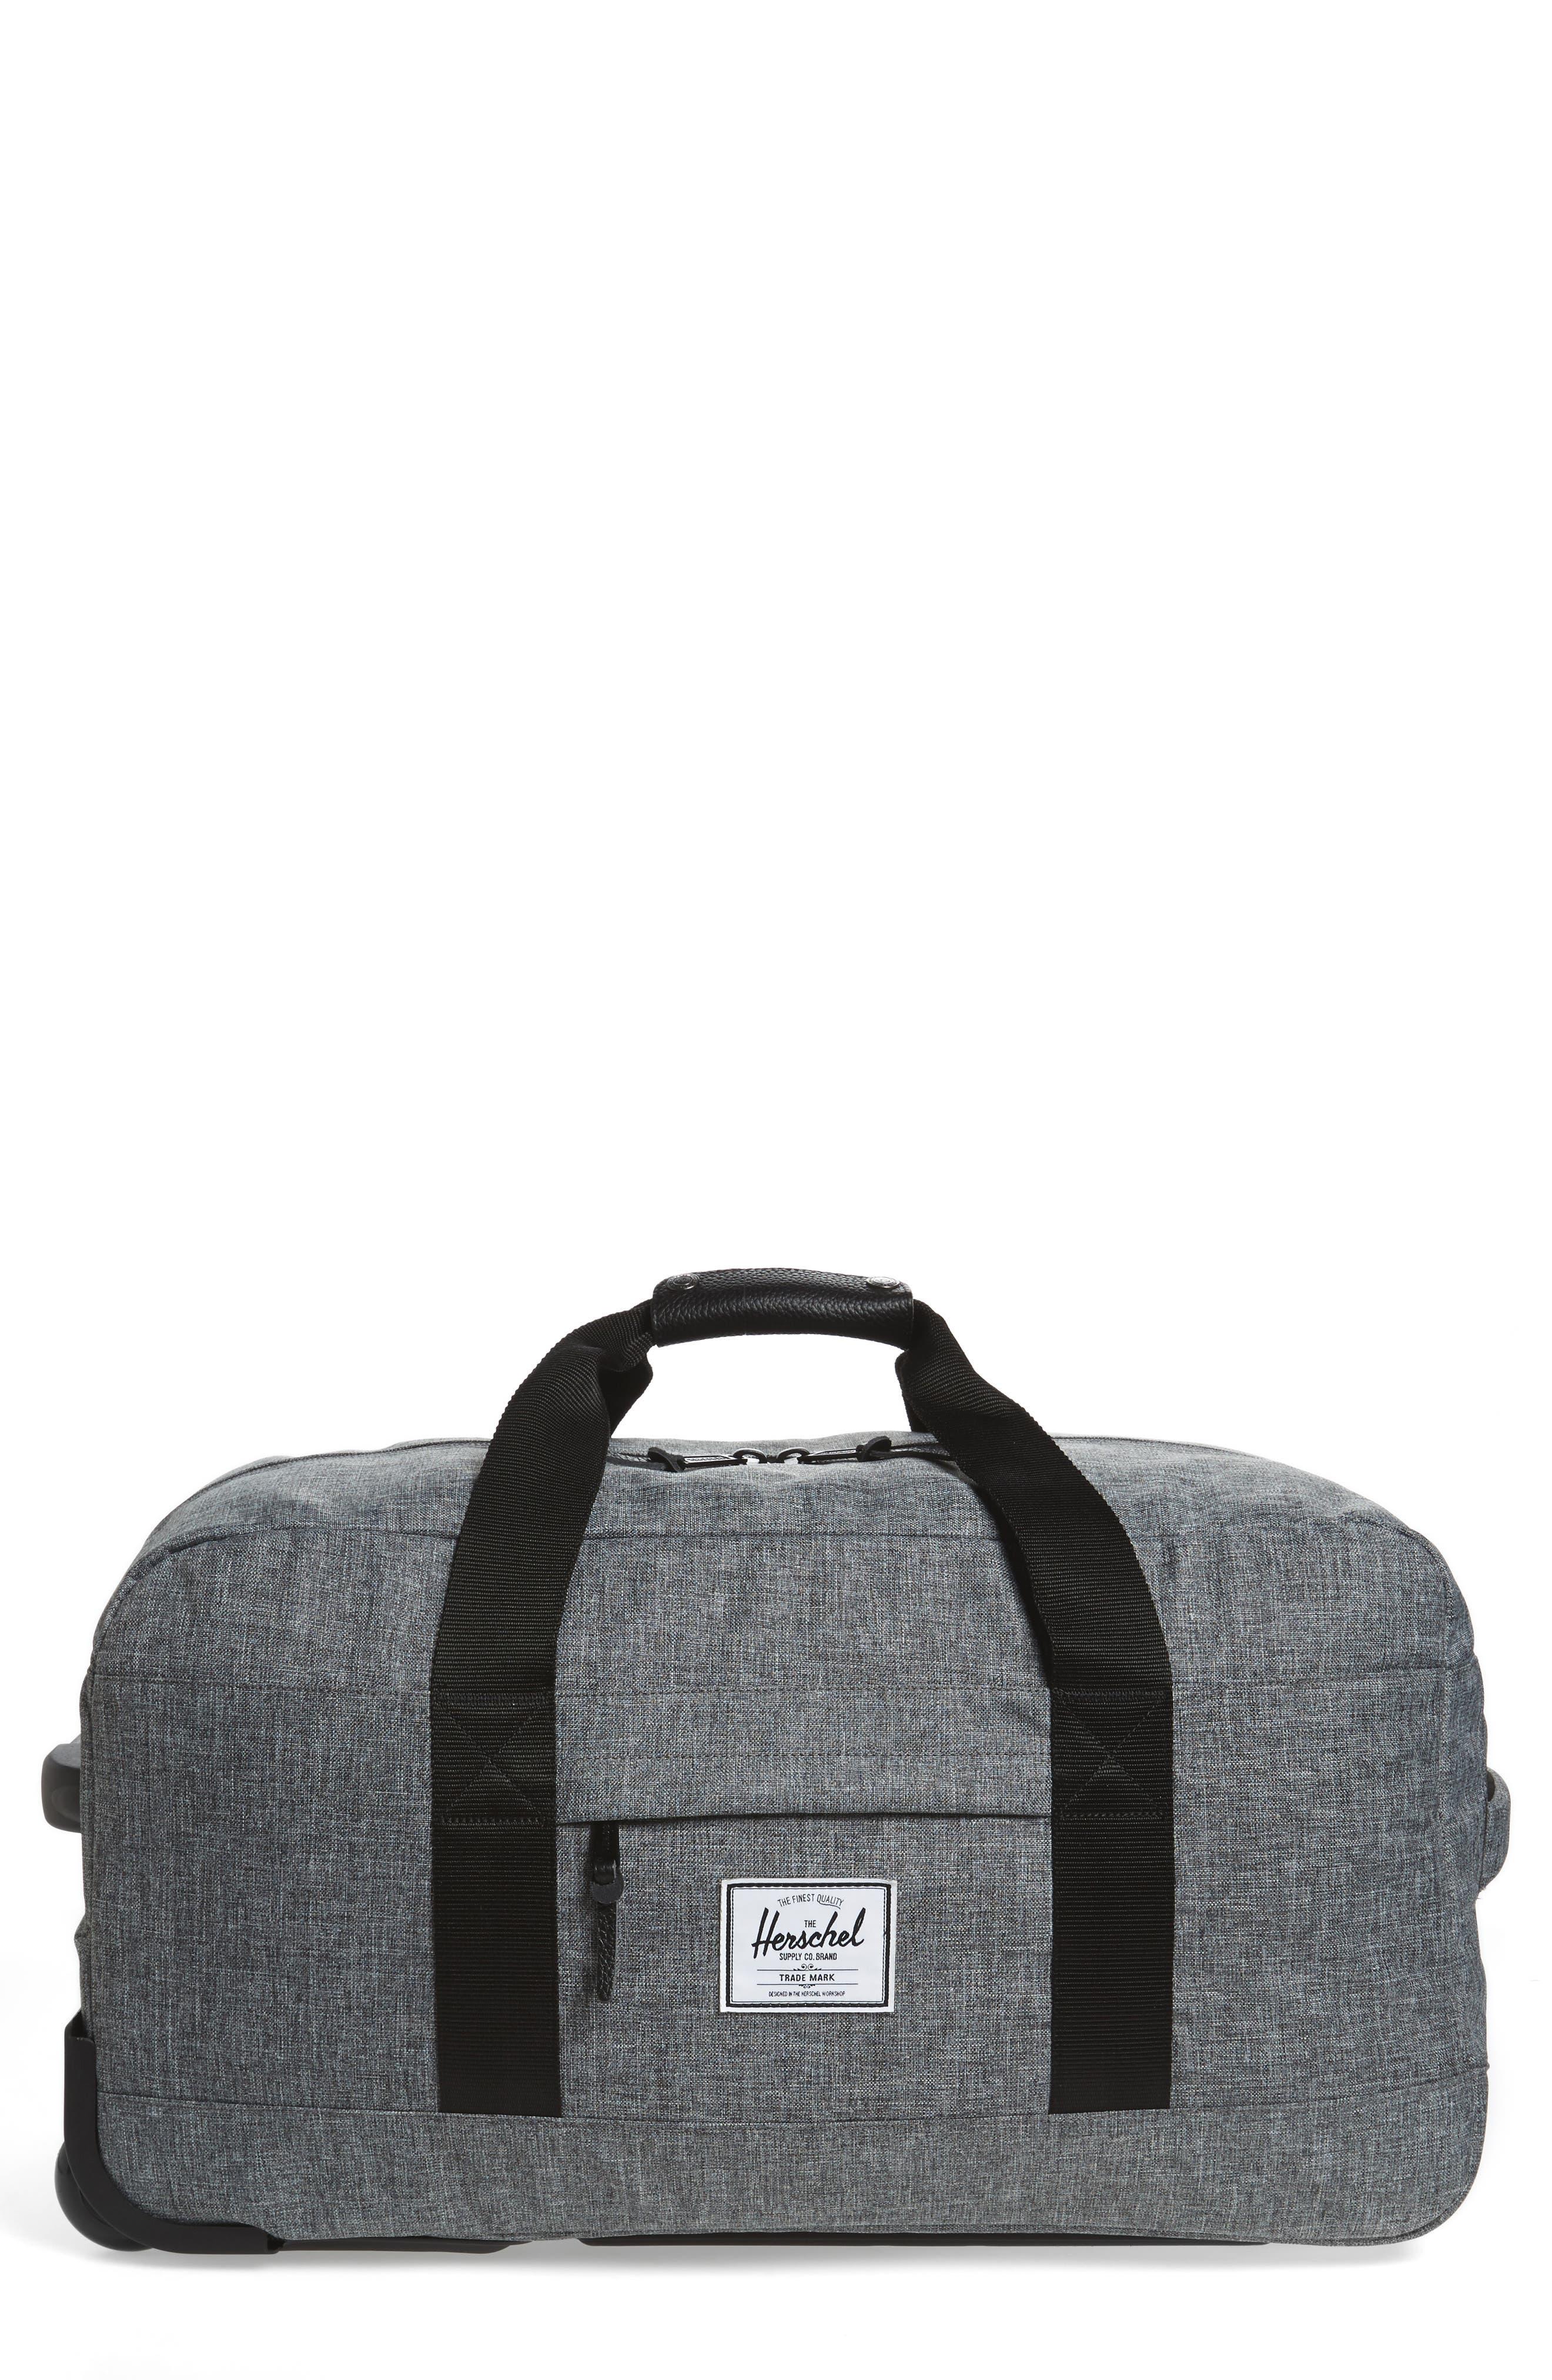 Wheelie Outfitter 24-Inch Duffel Bag,                             Main thumbnail 1, color,